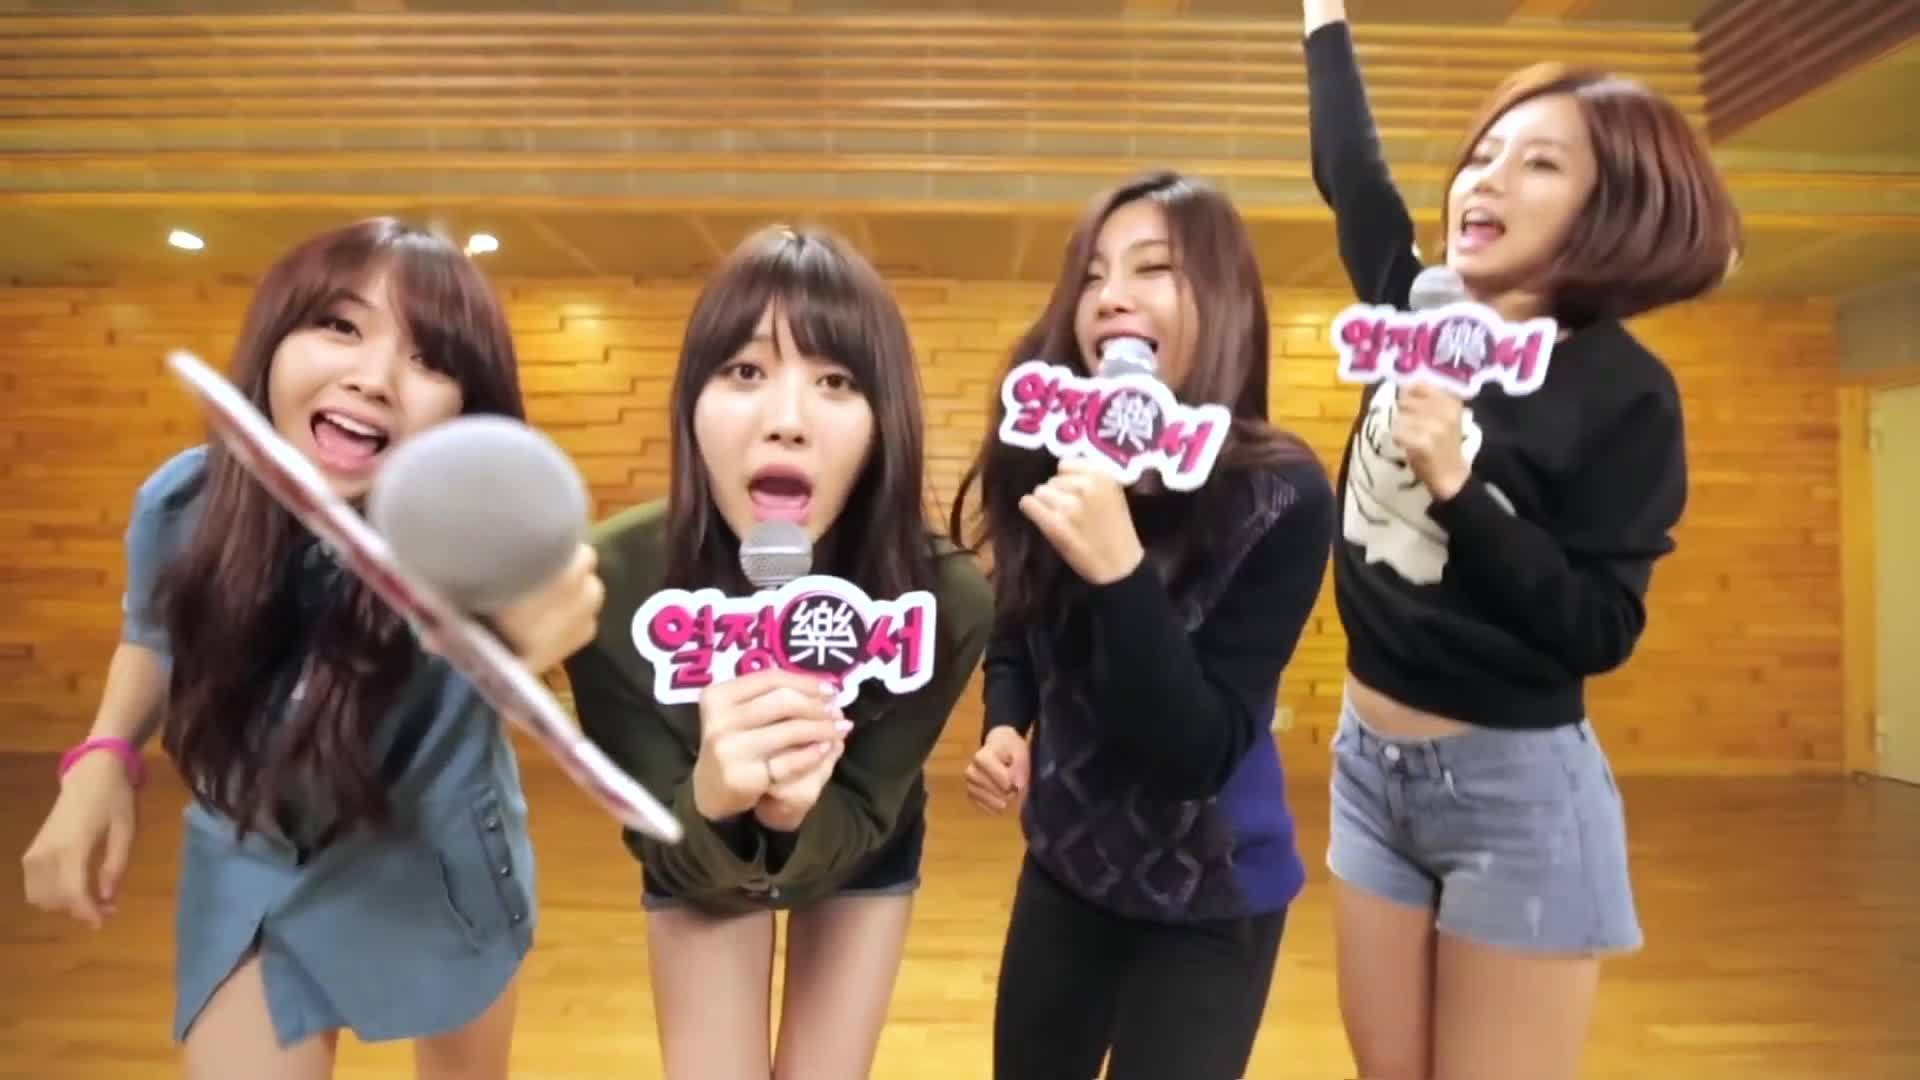 girl'sday, ohmygod, 걸스데이, GIRL'S DAY - OH! MY GOD(오마이갓) M/V GIFs